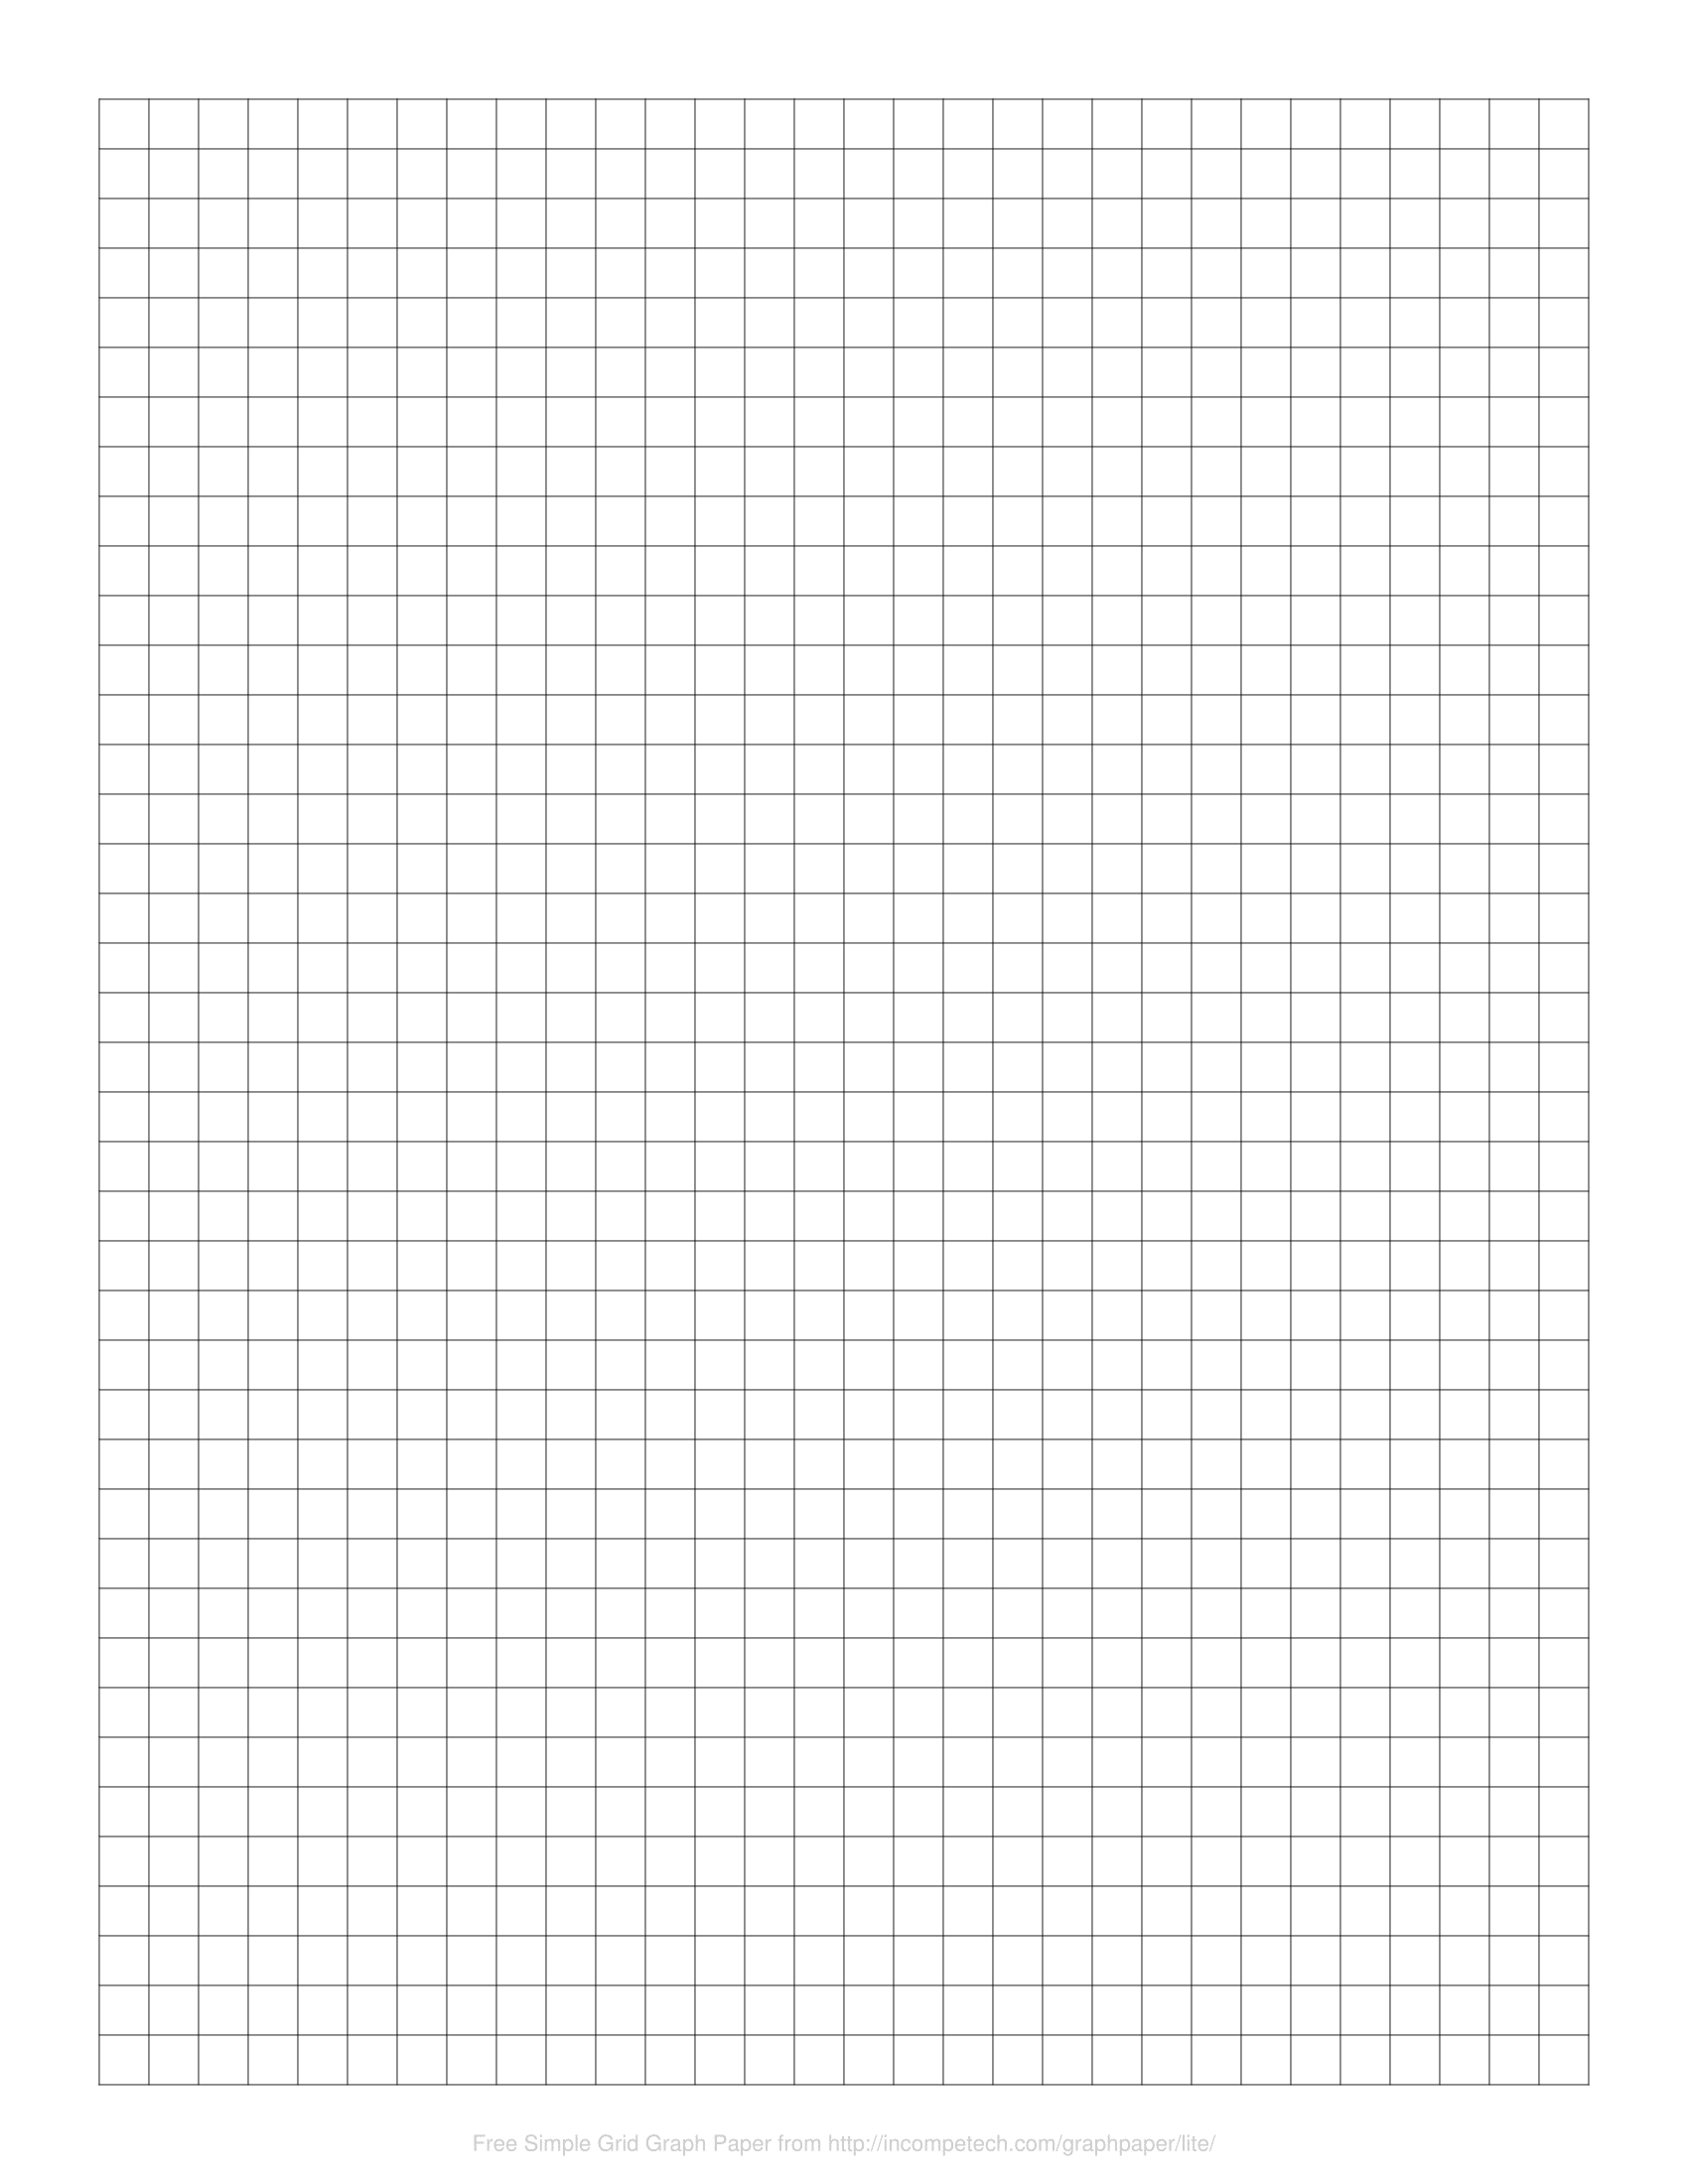 Graph Paper 25x25